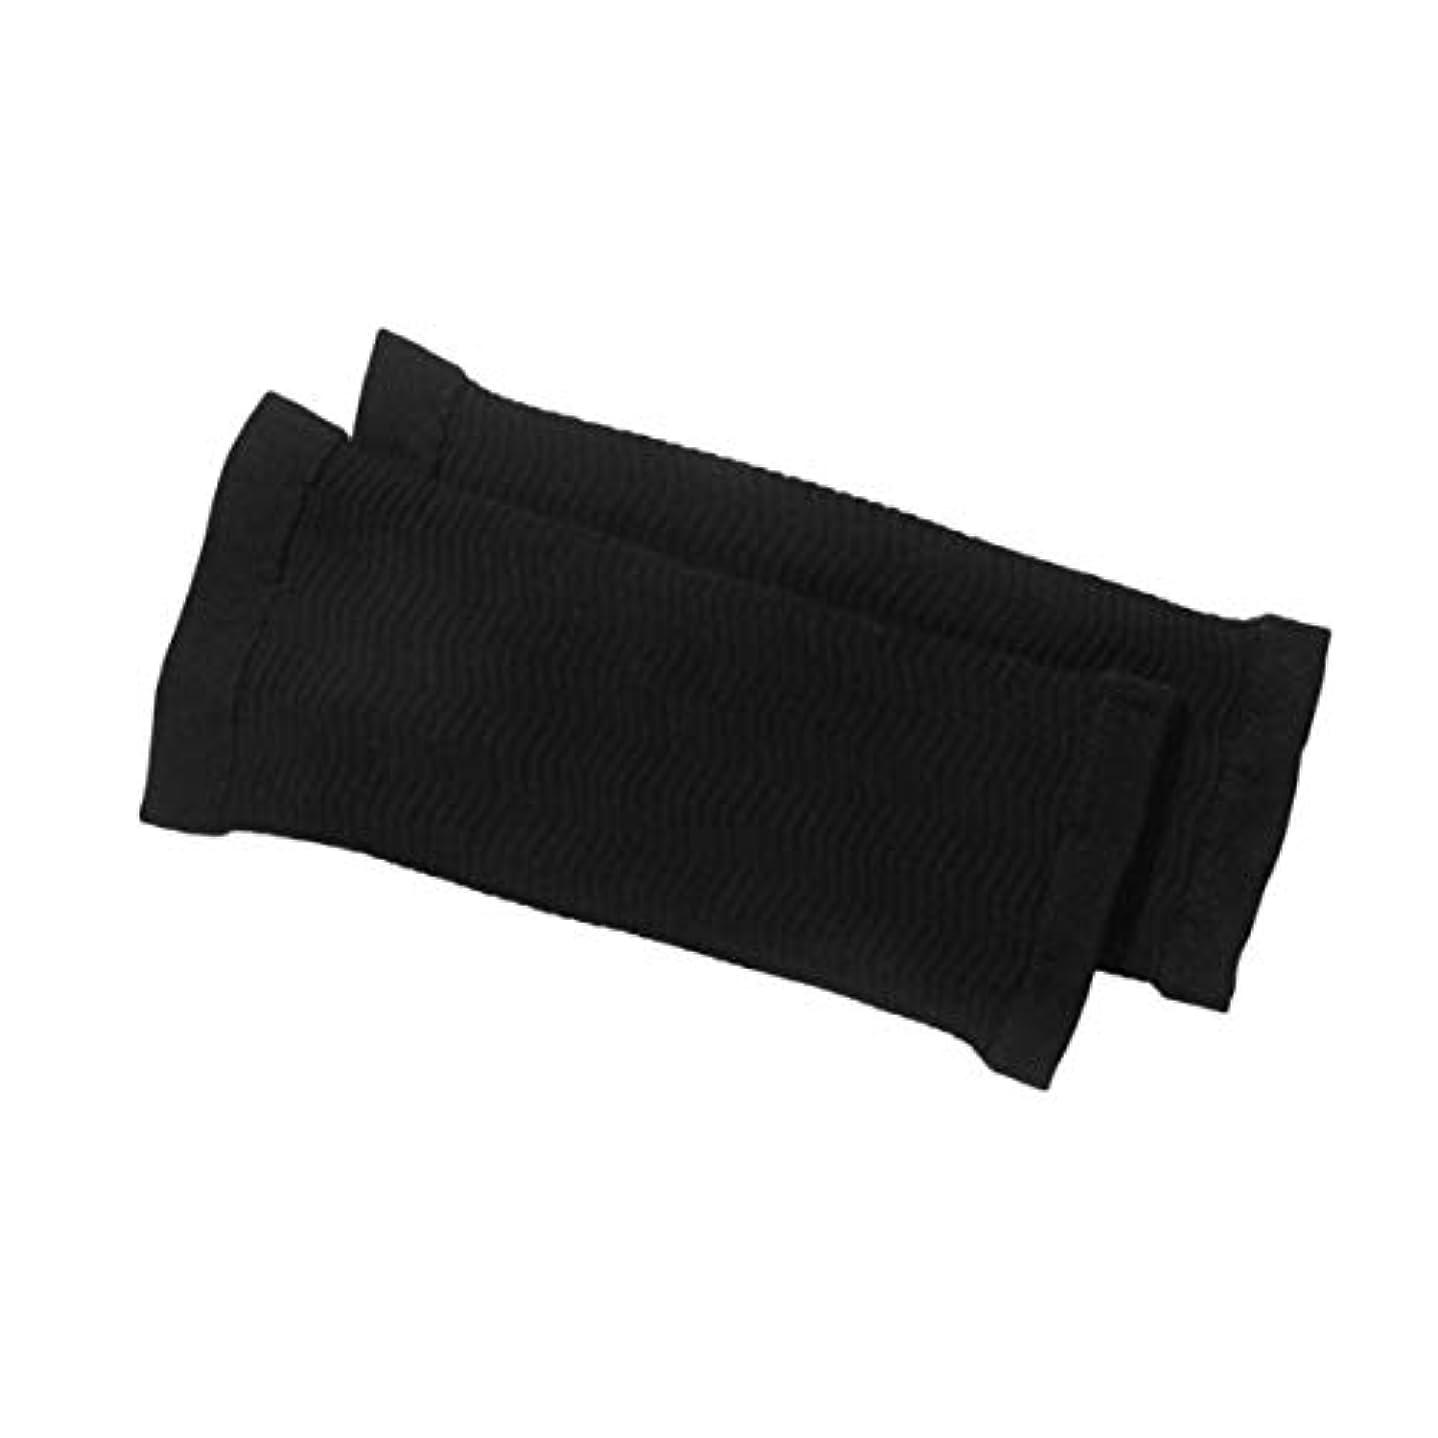 Saikogoods 1ペア420 d圧縮痩身アームスリーブワークアウトトーニングバーンセルライトシェイパー脂肪燃焼袖用女性